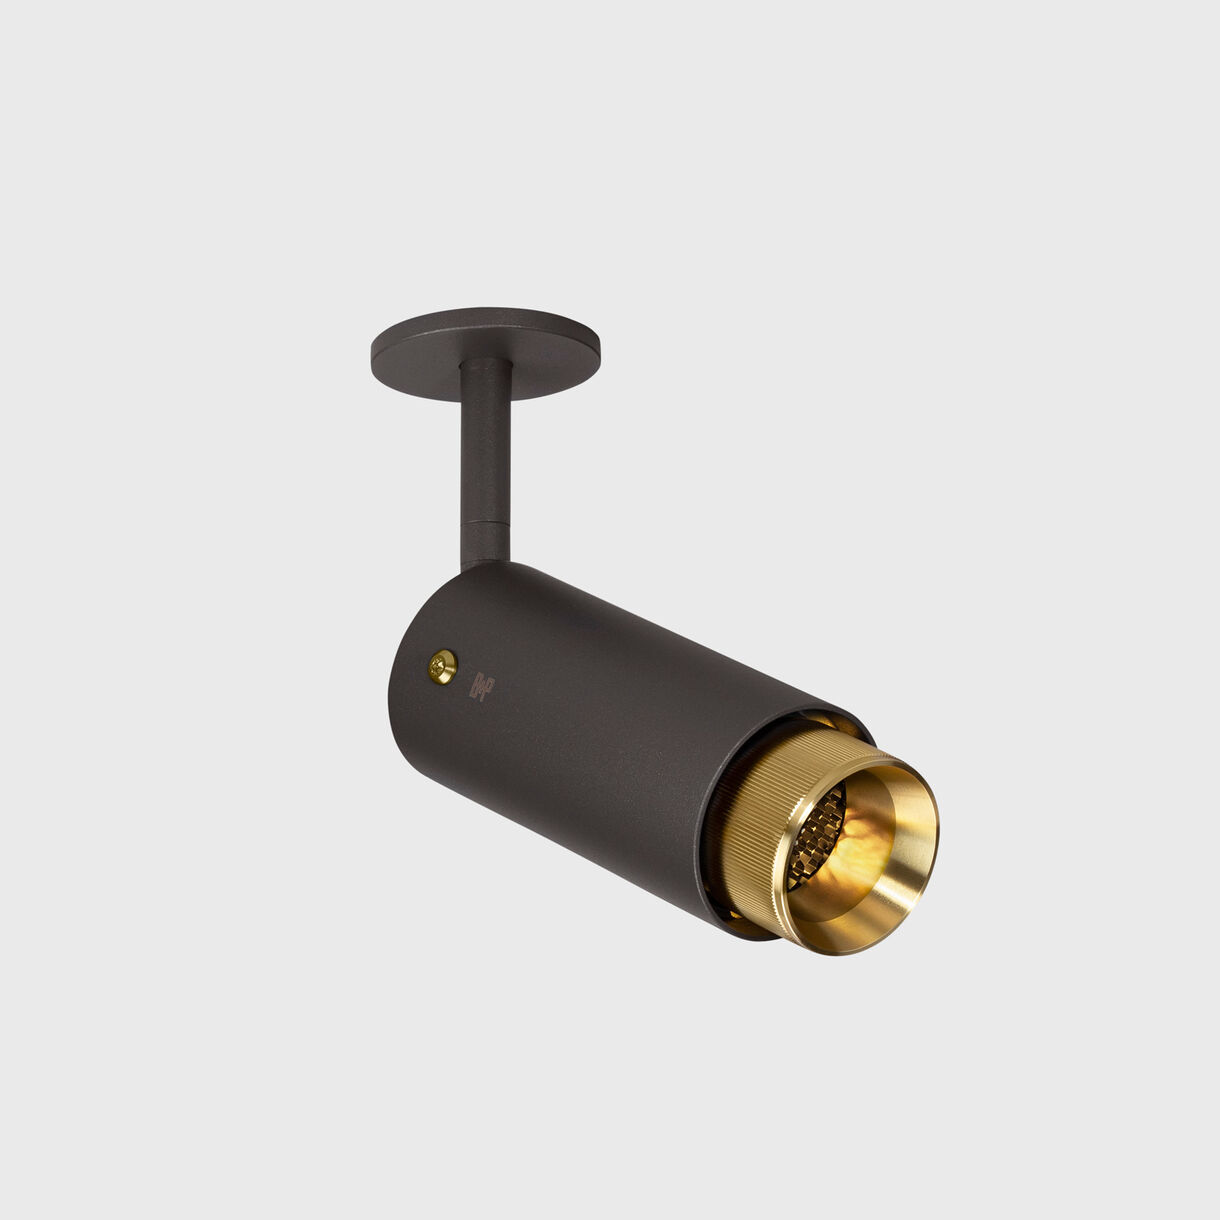 Exhaust Spotlight, Graphite & Brass